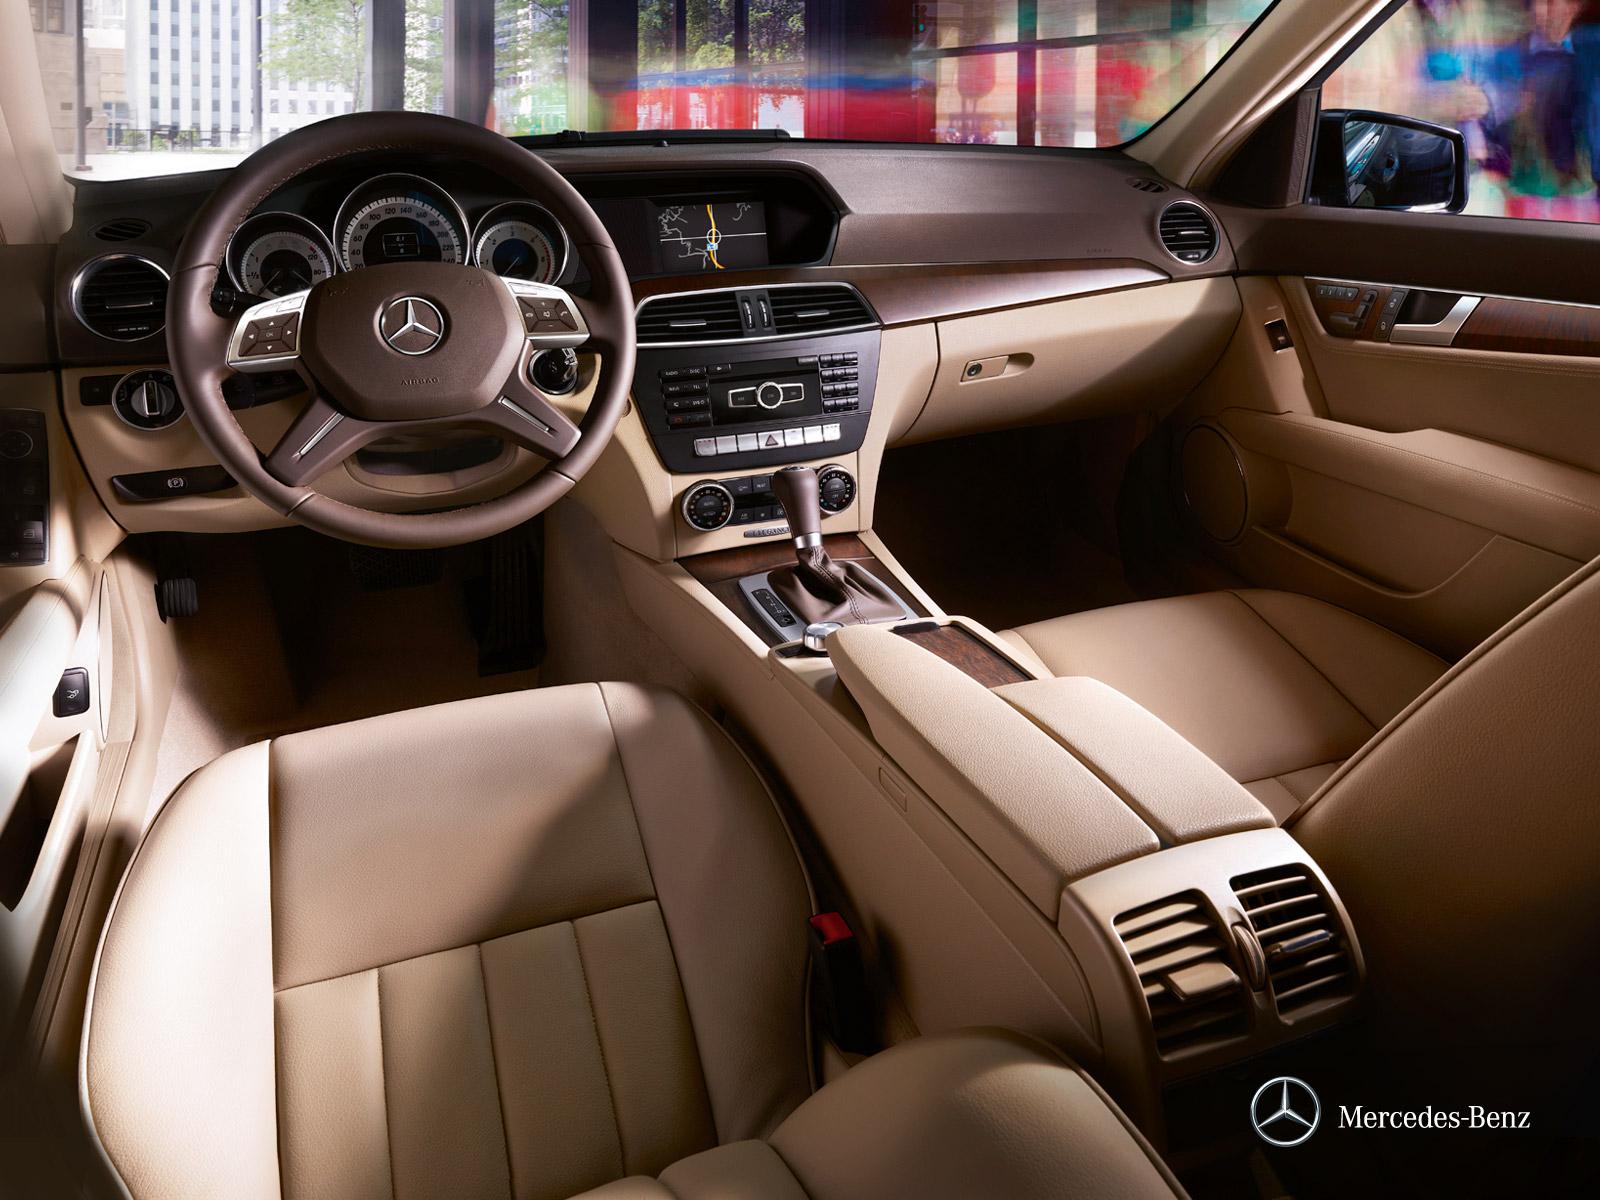 Mercedes Benz C180 Amg Mercedes Resimleri